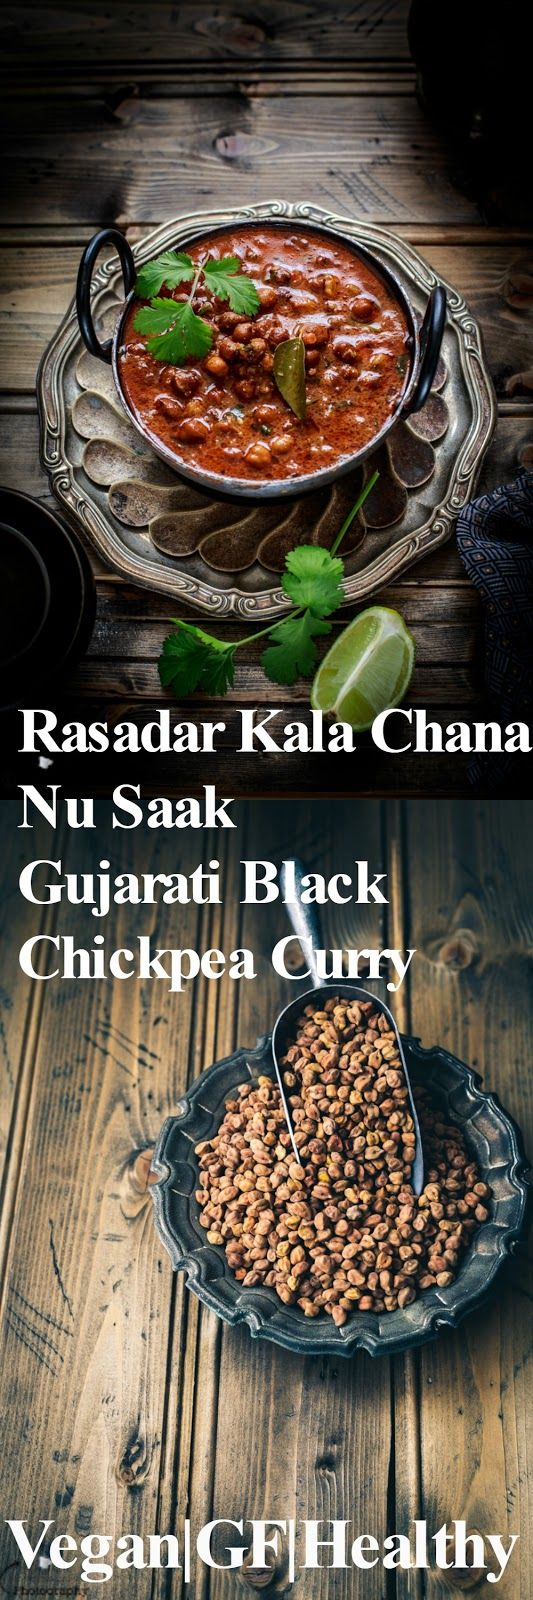 Jagruti's Cooking Odyssey: Rasadar Kala Chana Nu Saak - Gujarati Black Chickpea Curry